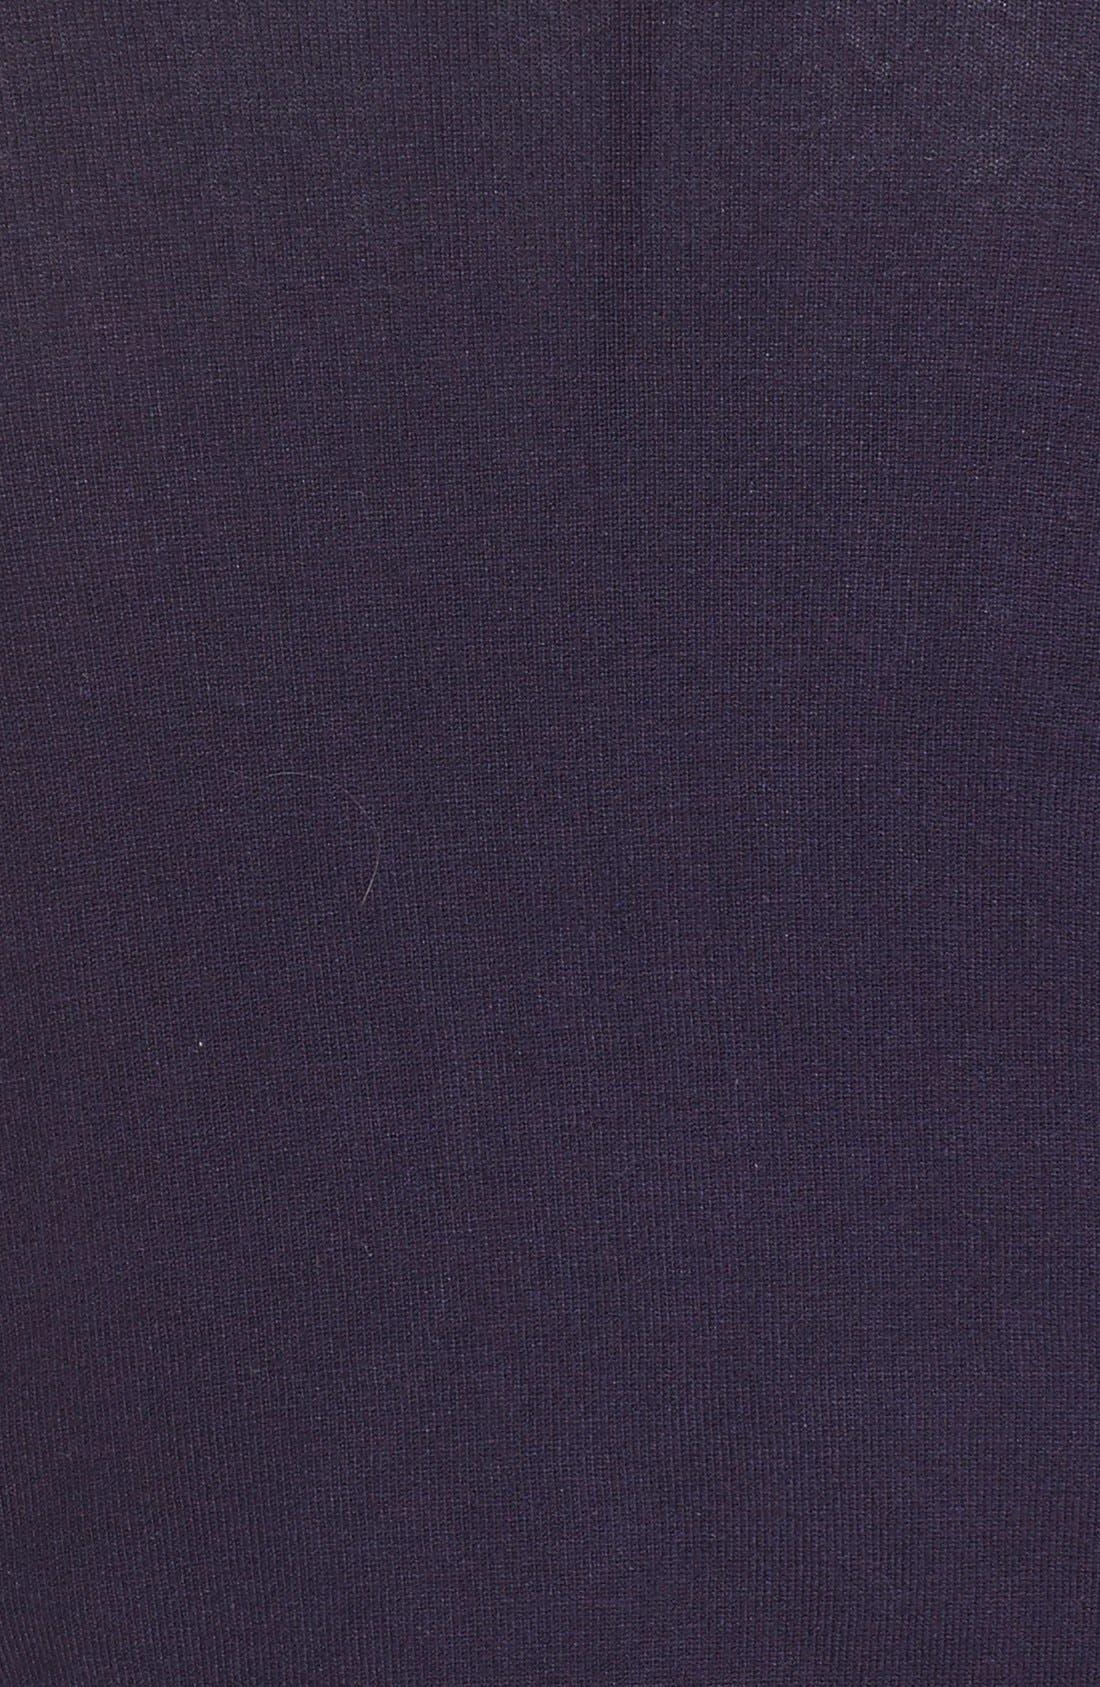 Three Quarter Sleeve Shrug,                             Alternate thumbnail 5, color,                             Navy